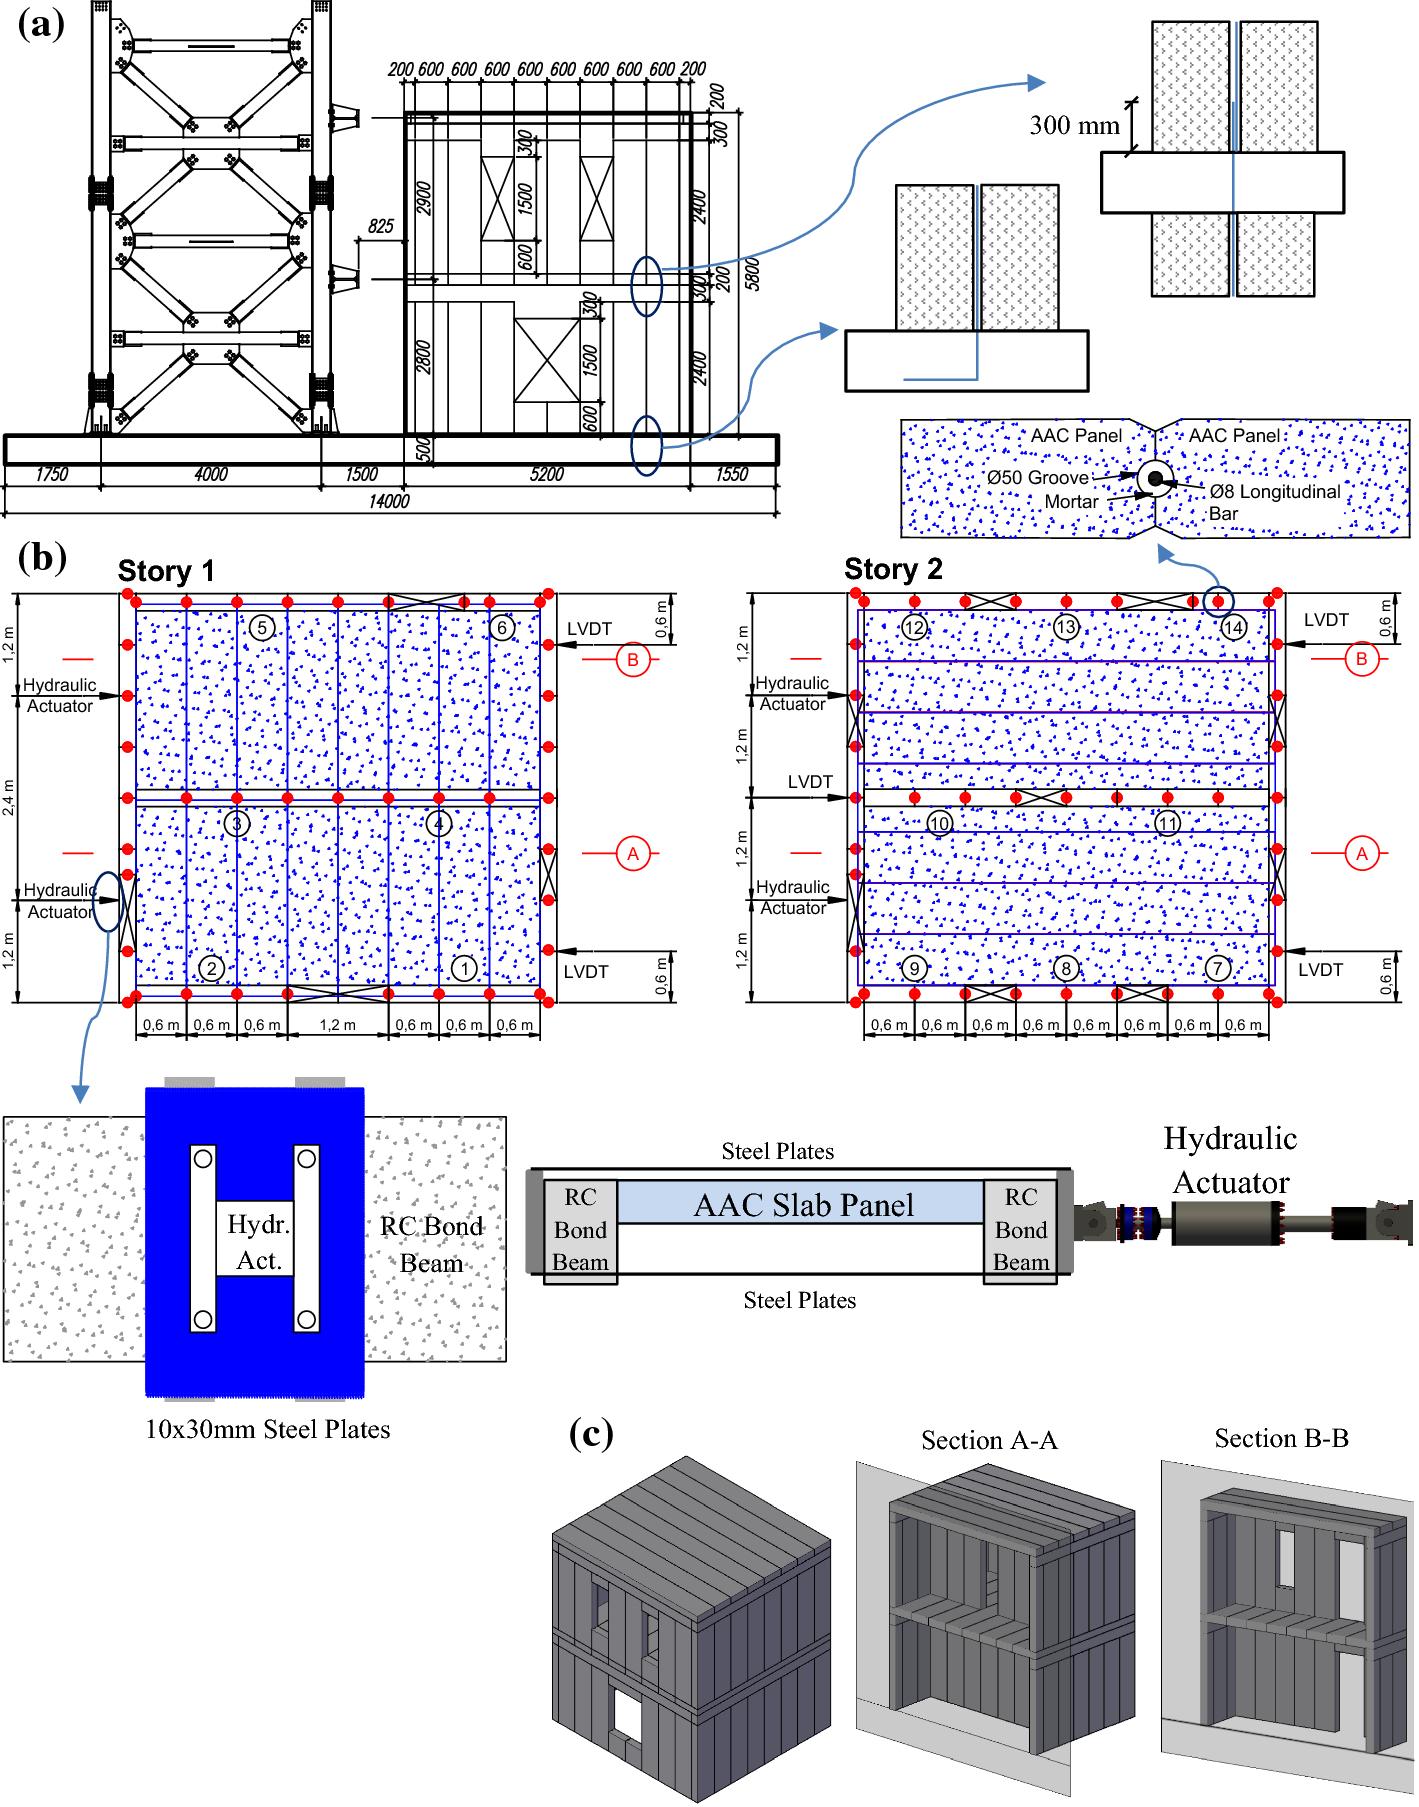 Seismic behavior of autoclaved aerated concrete low rise